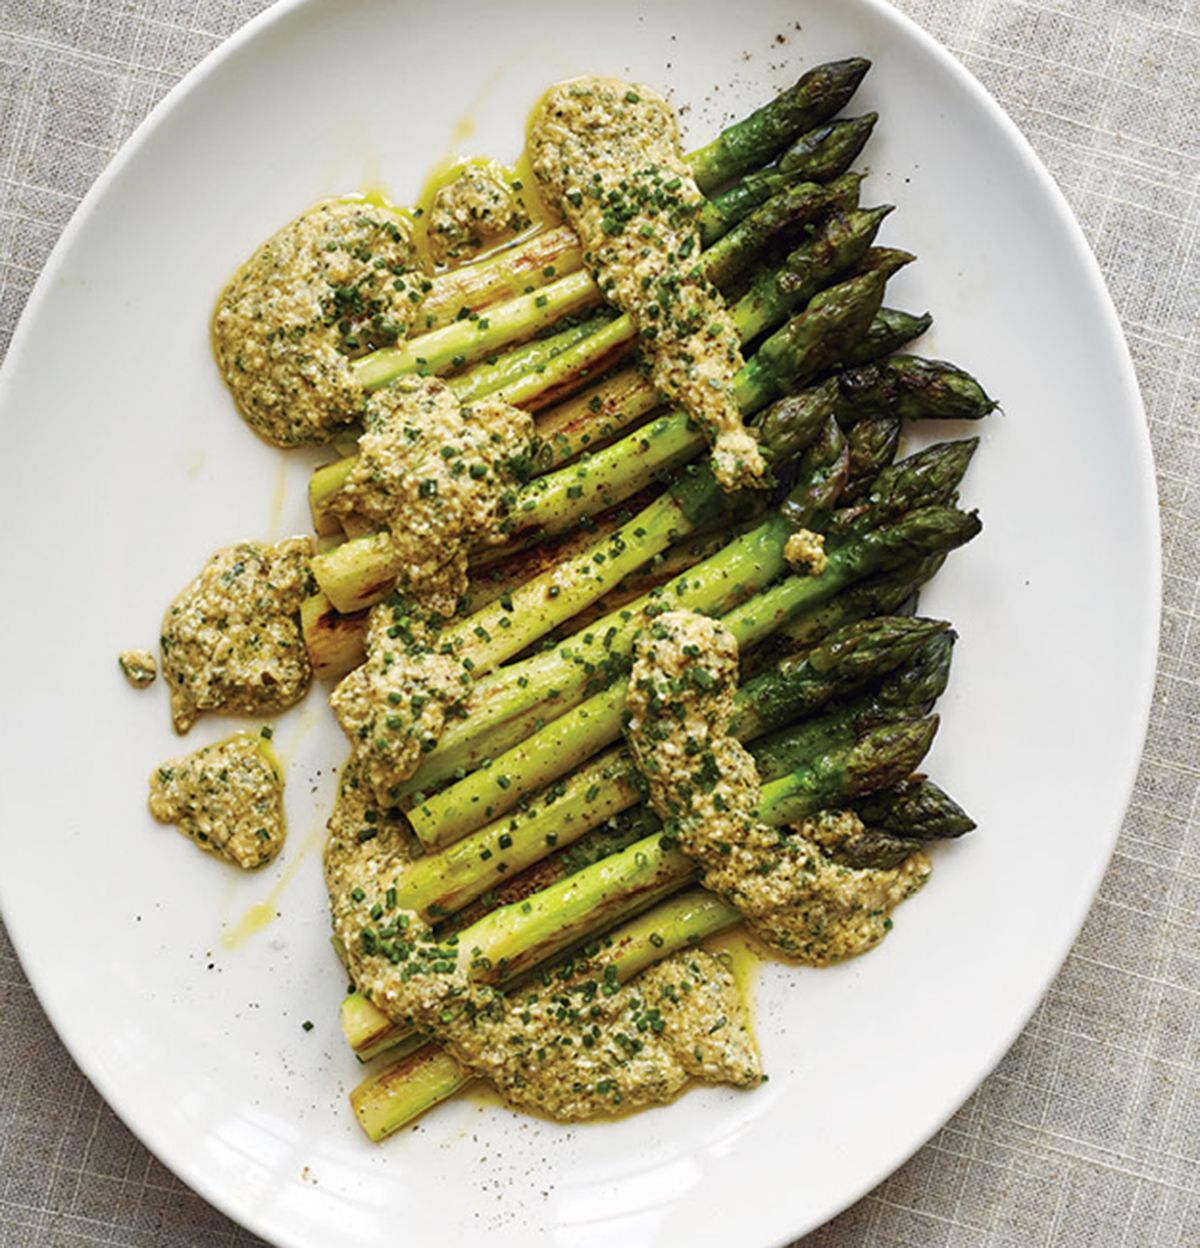 Recipe: Asparagus with Sauce Gribiche